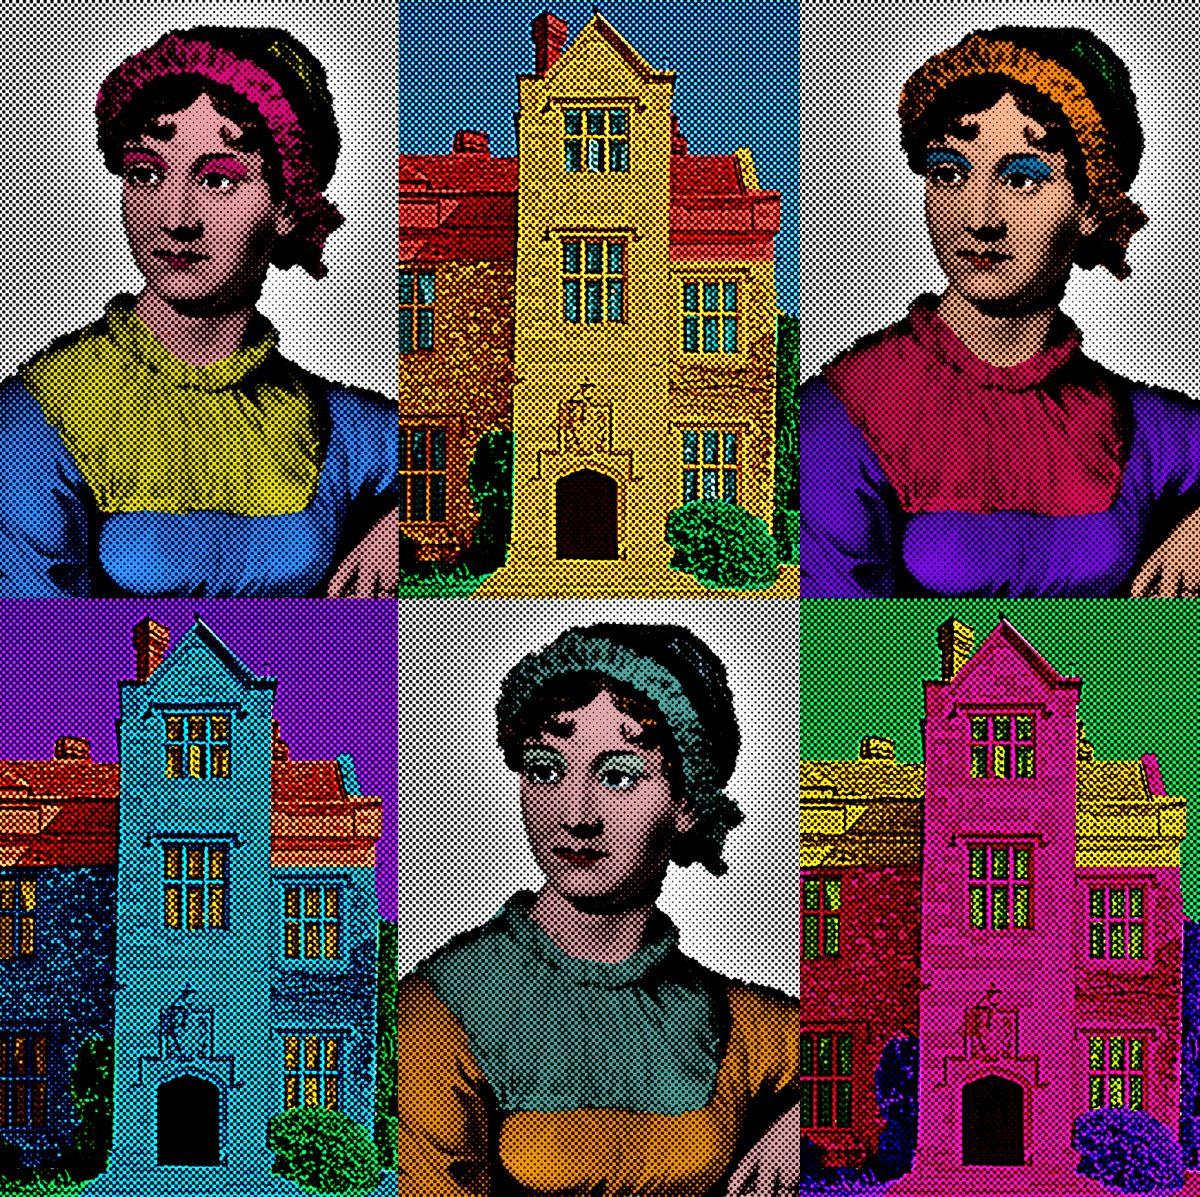 Reimagining Jane Austen's Great House